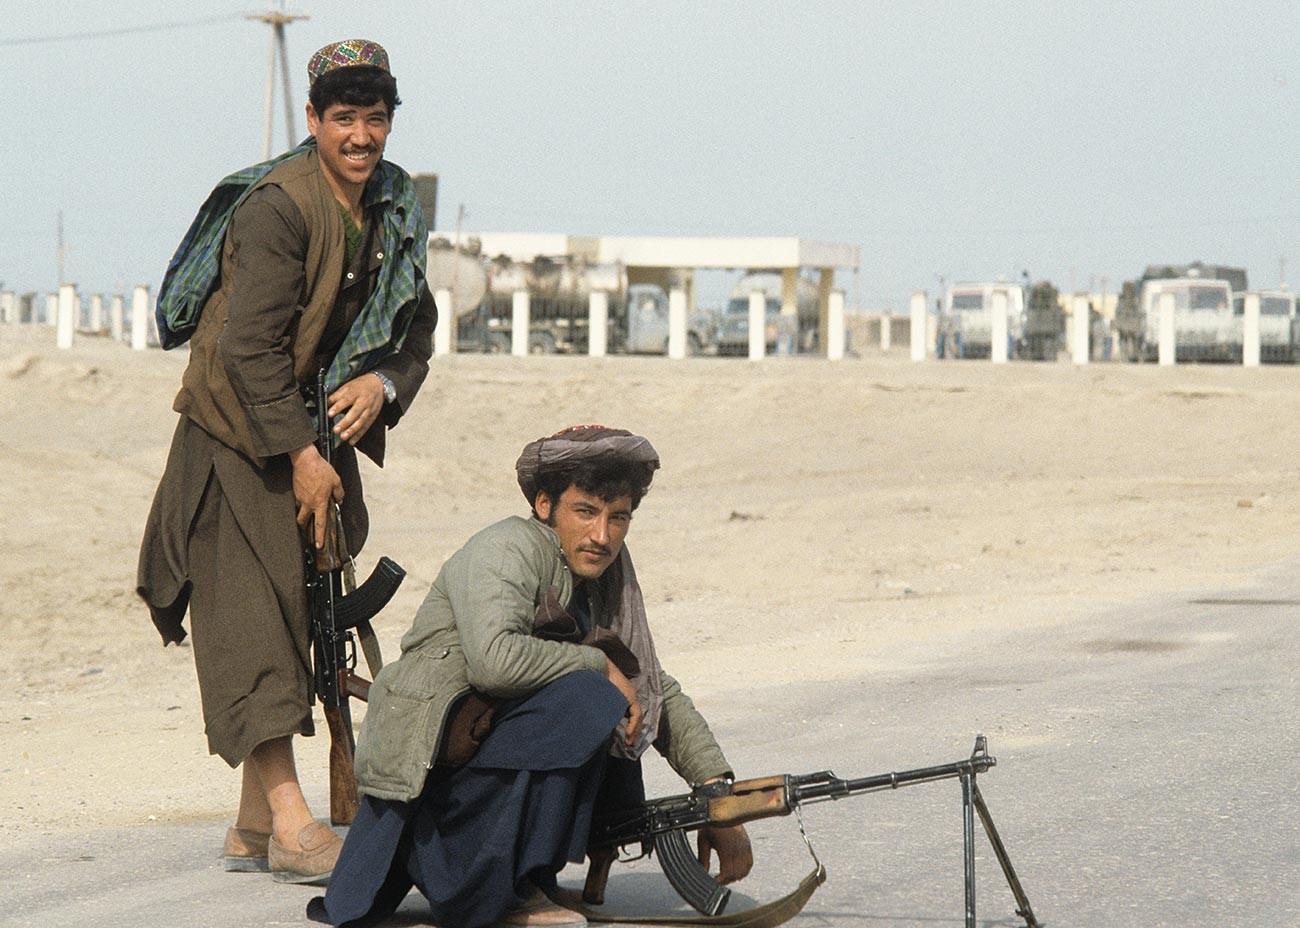 Mujahidin, pemberontak Islamis Afganistan. V. Kiselev